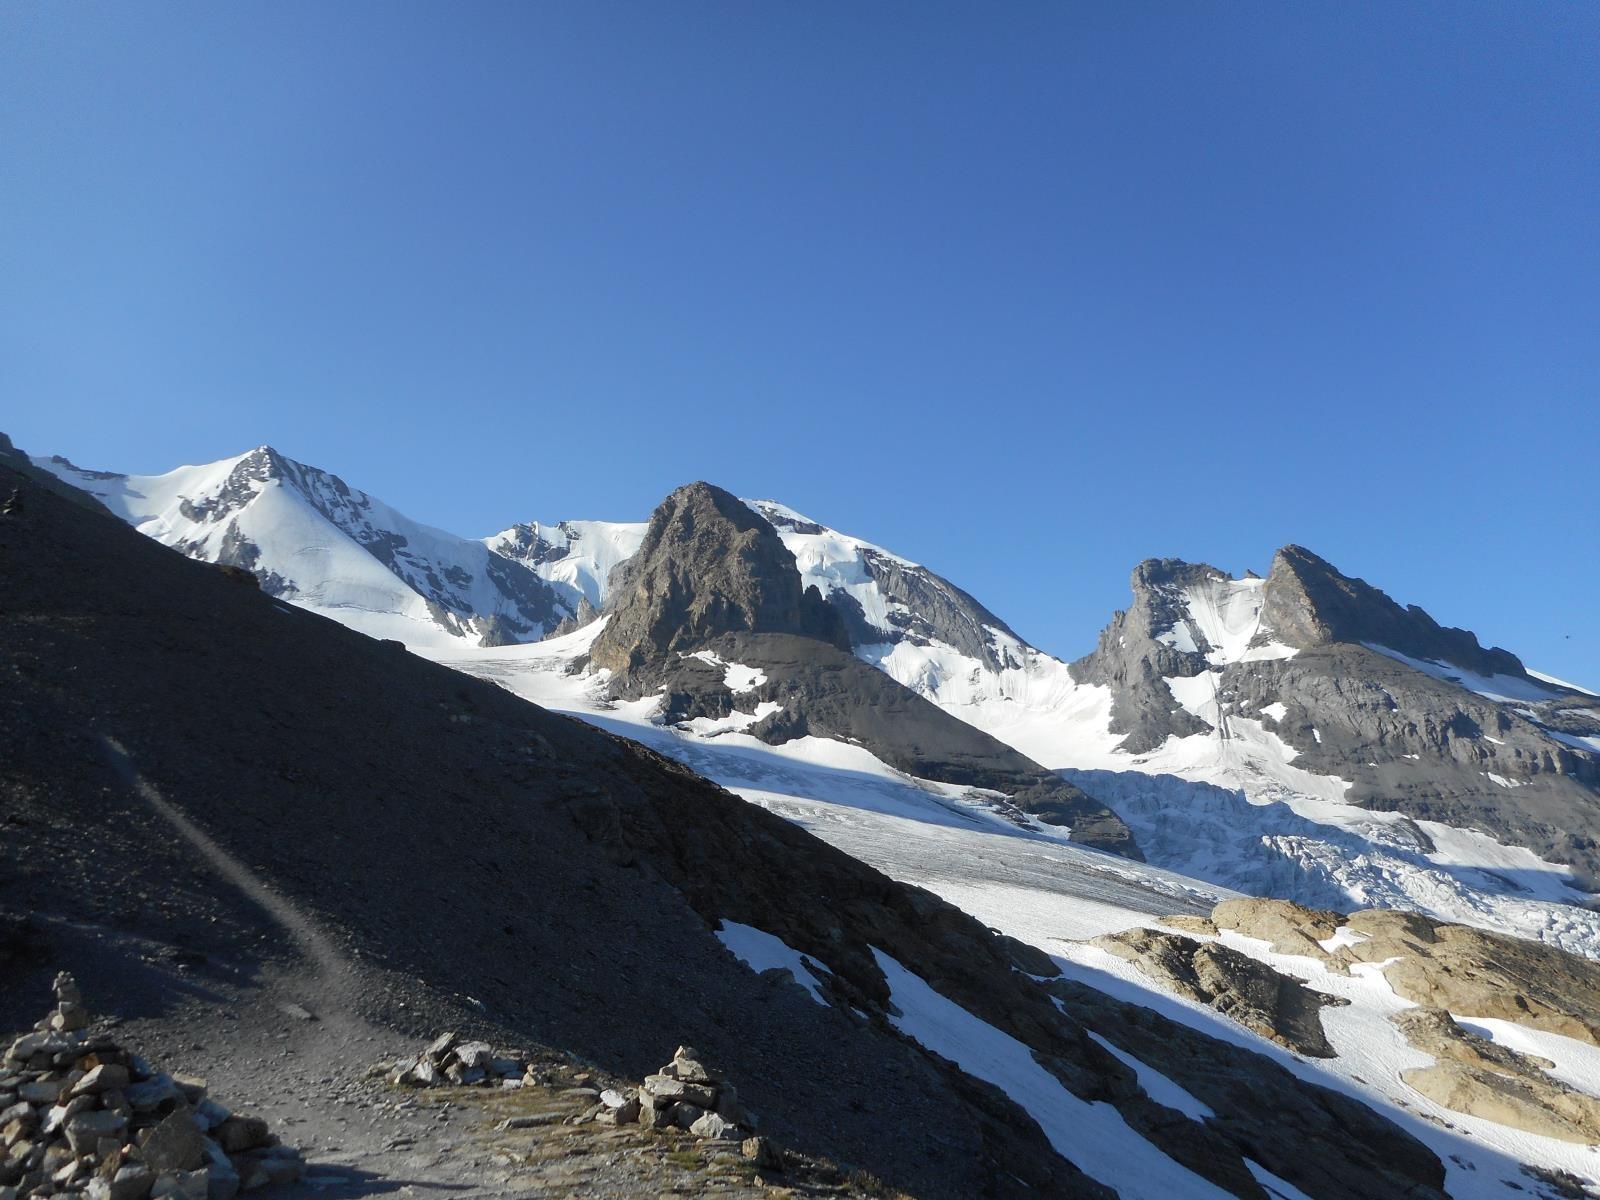 Dodelhorn et Gspaltenhorn (3436m)